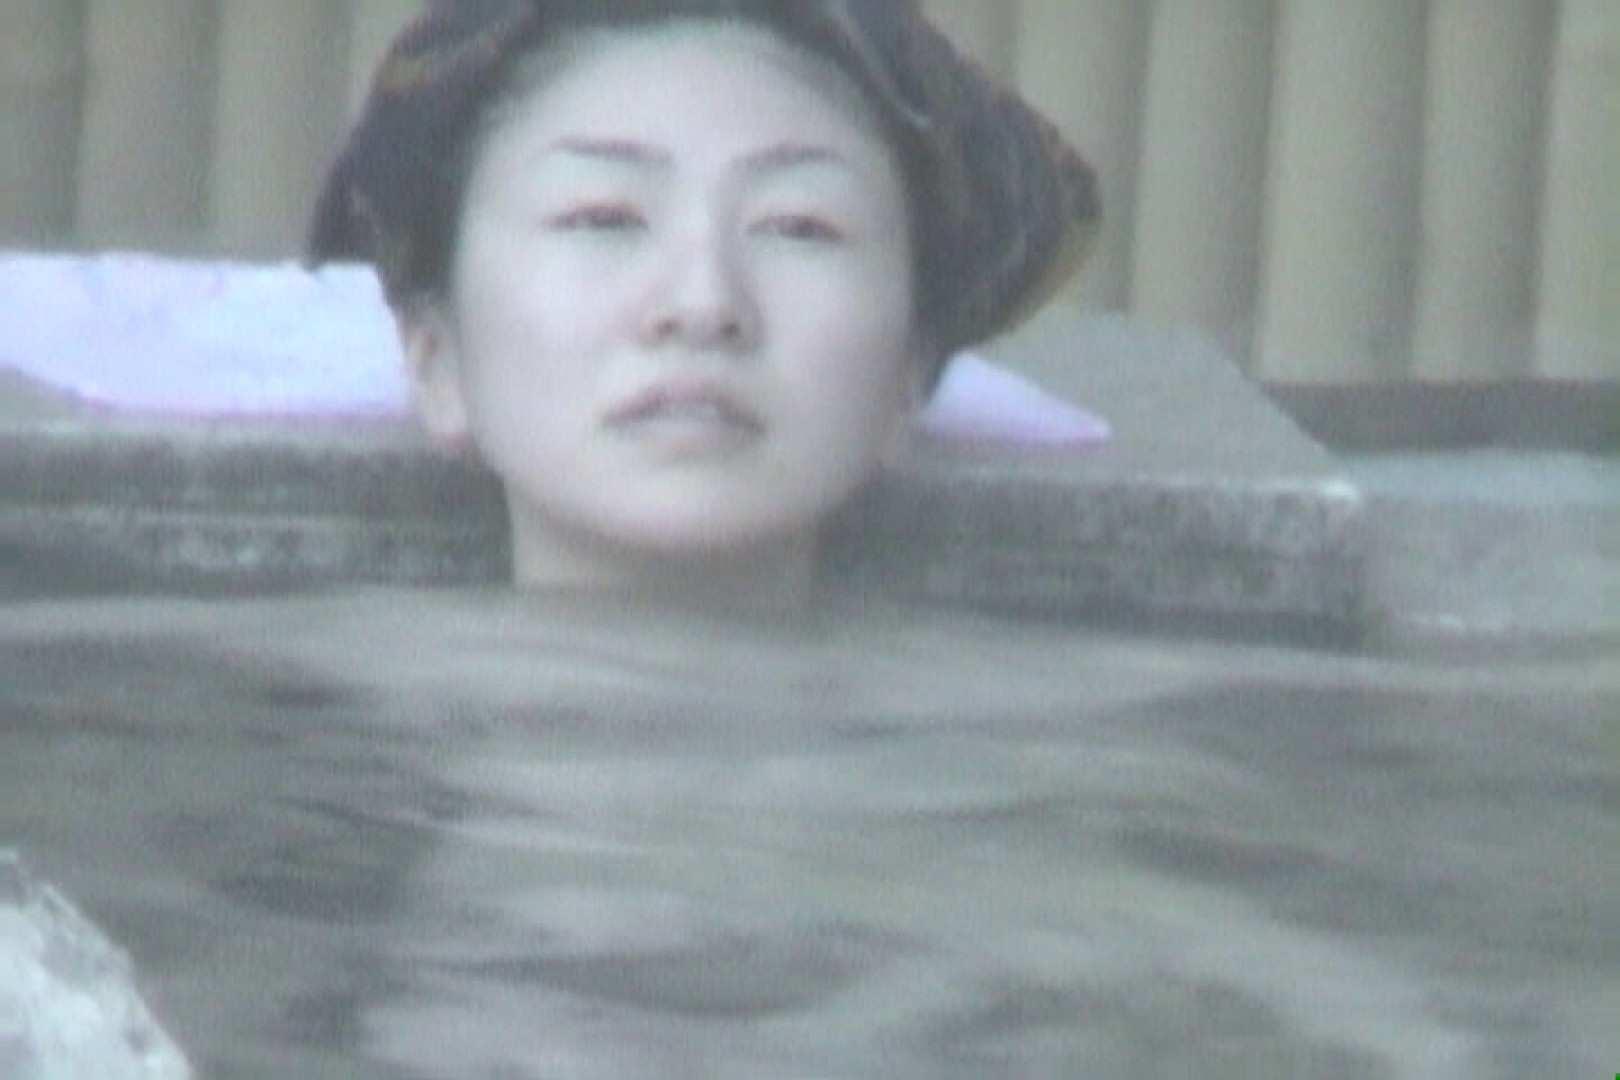 Aquaな露天風呂Vol.607 OL女体 盗み撮り動画キャプチャ 56連発 50